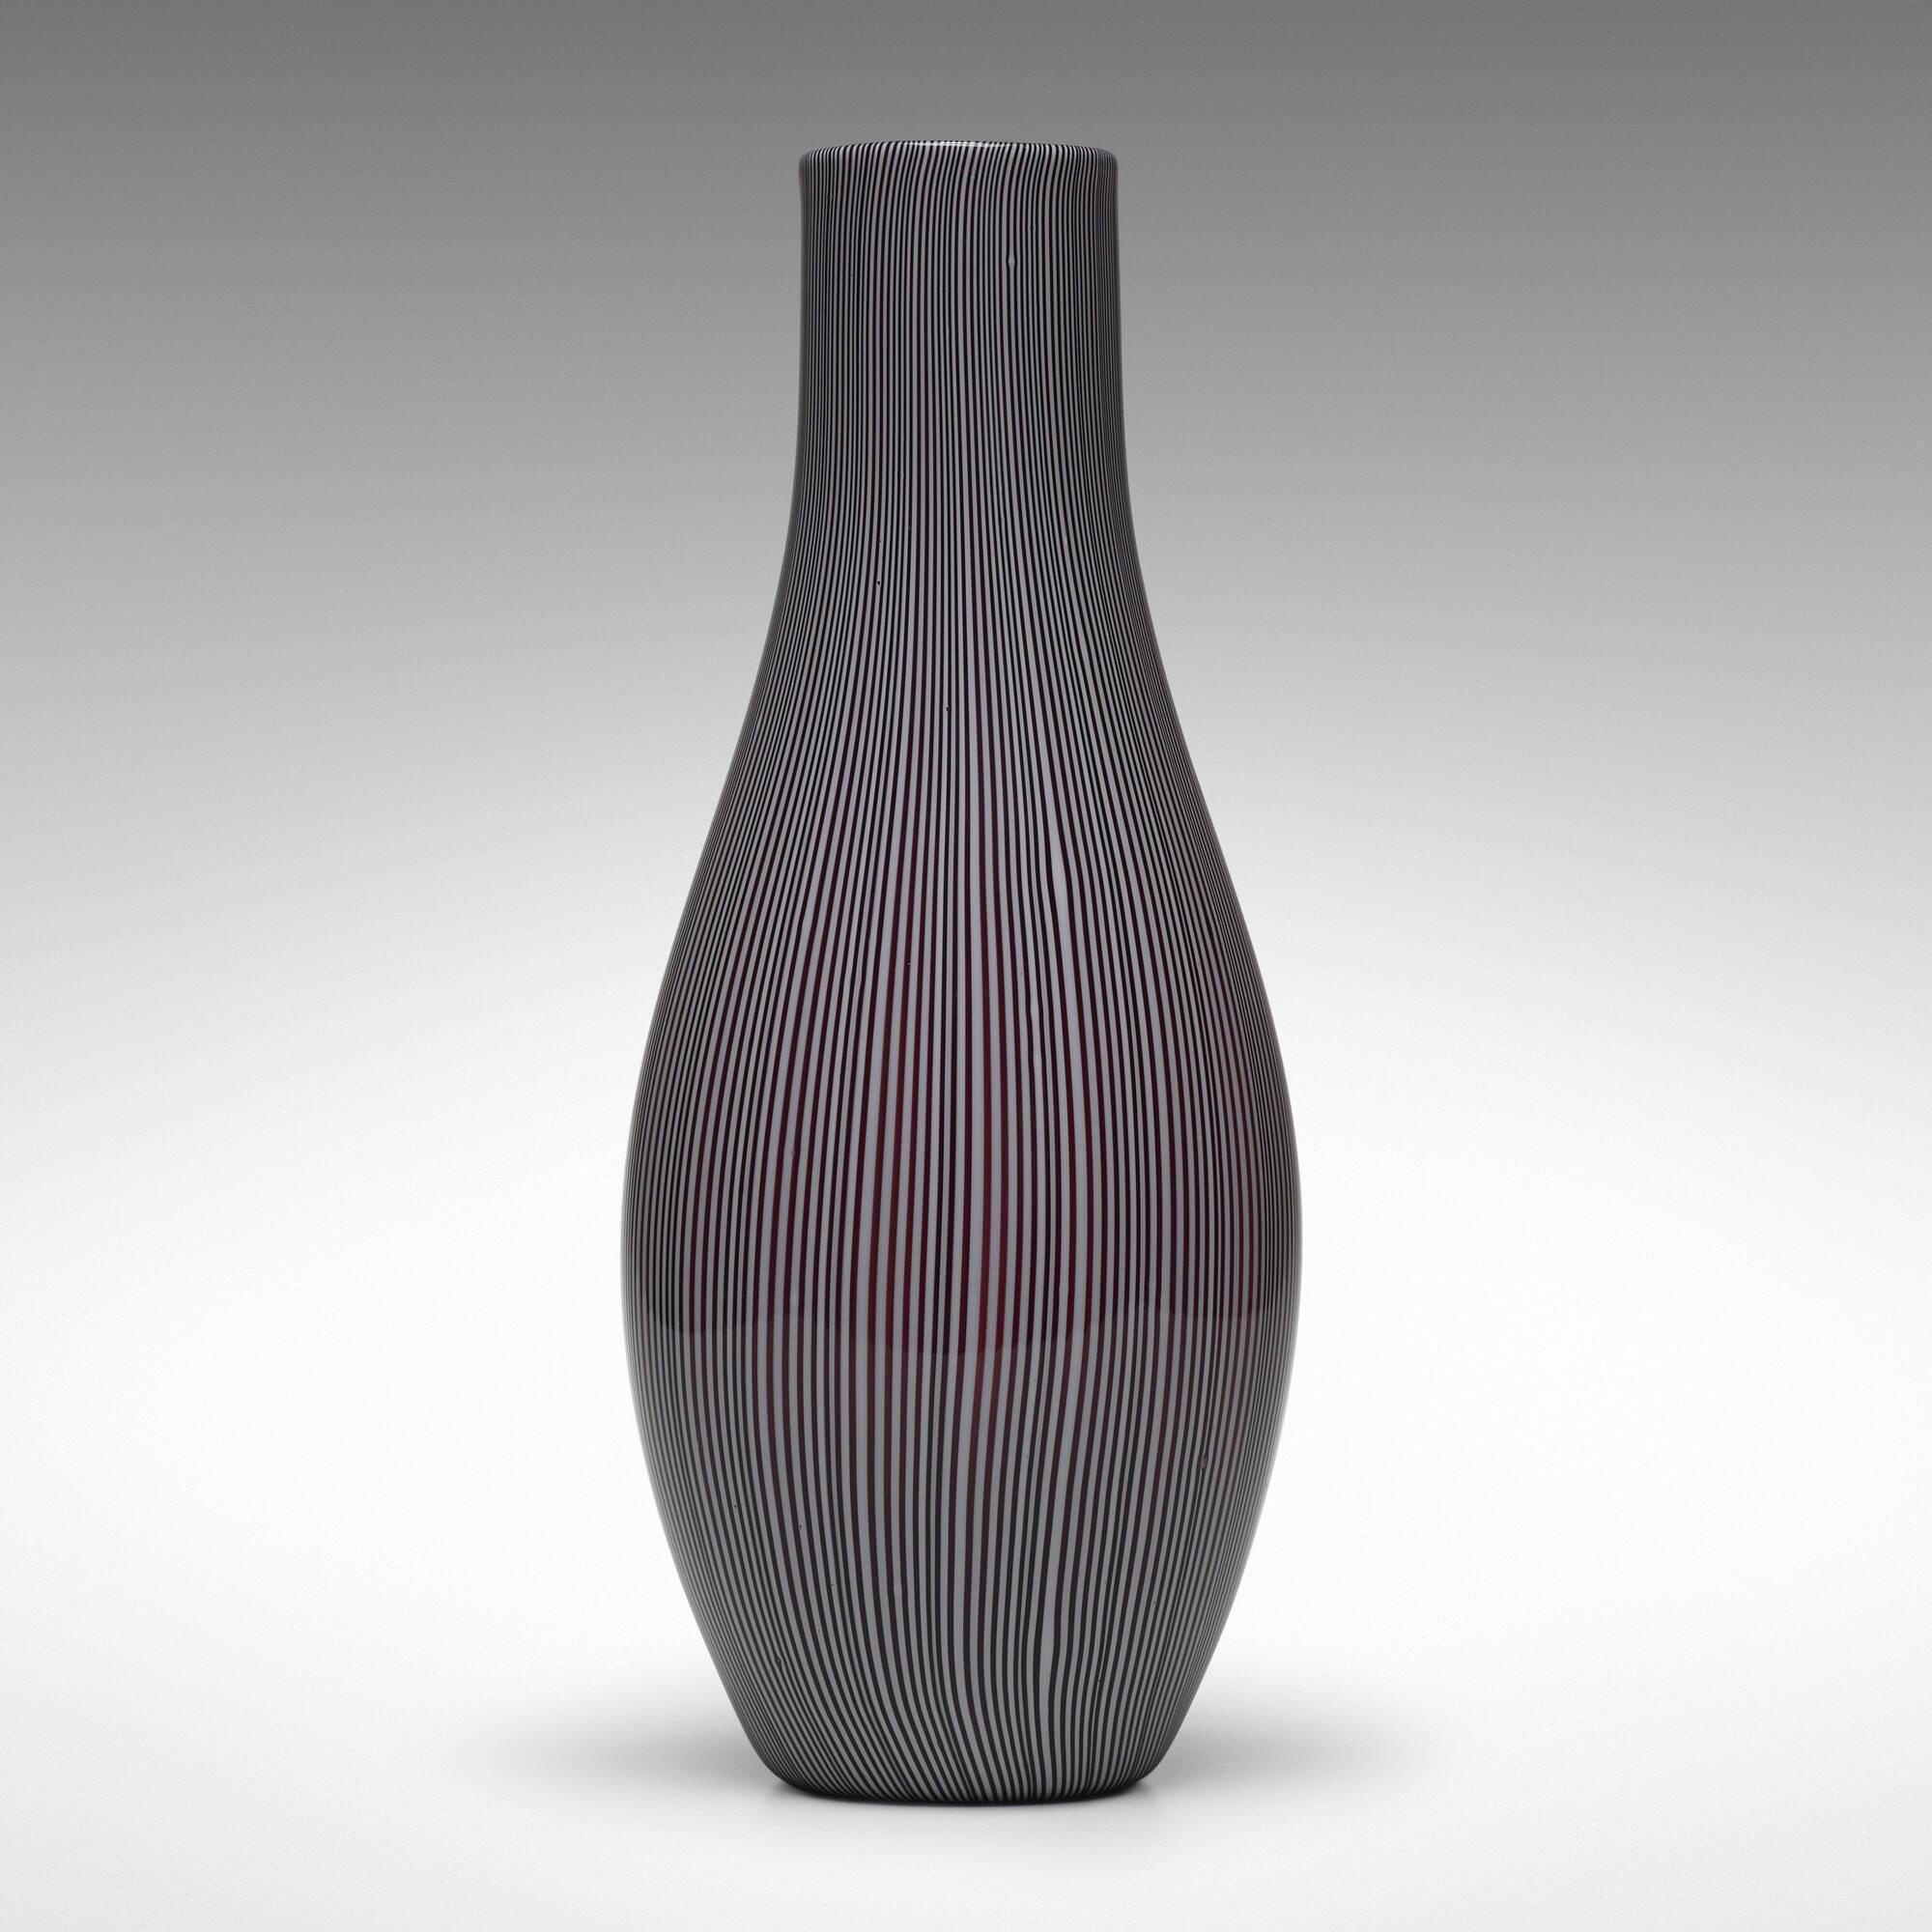 131 carlo scarpa tessuto vase 3547 important italian glass 131 carlo scarpa tessuto vase 3547 1 of 4 floridaeventfo Image collections